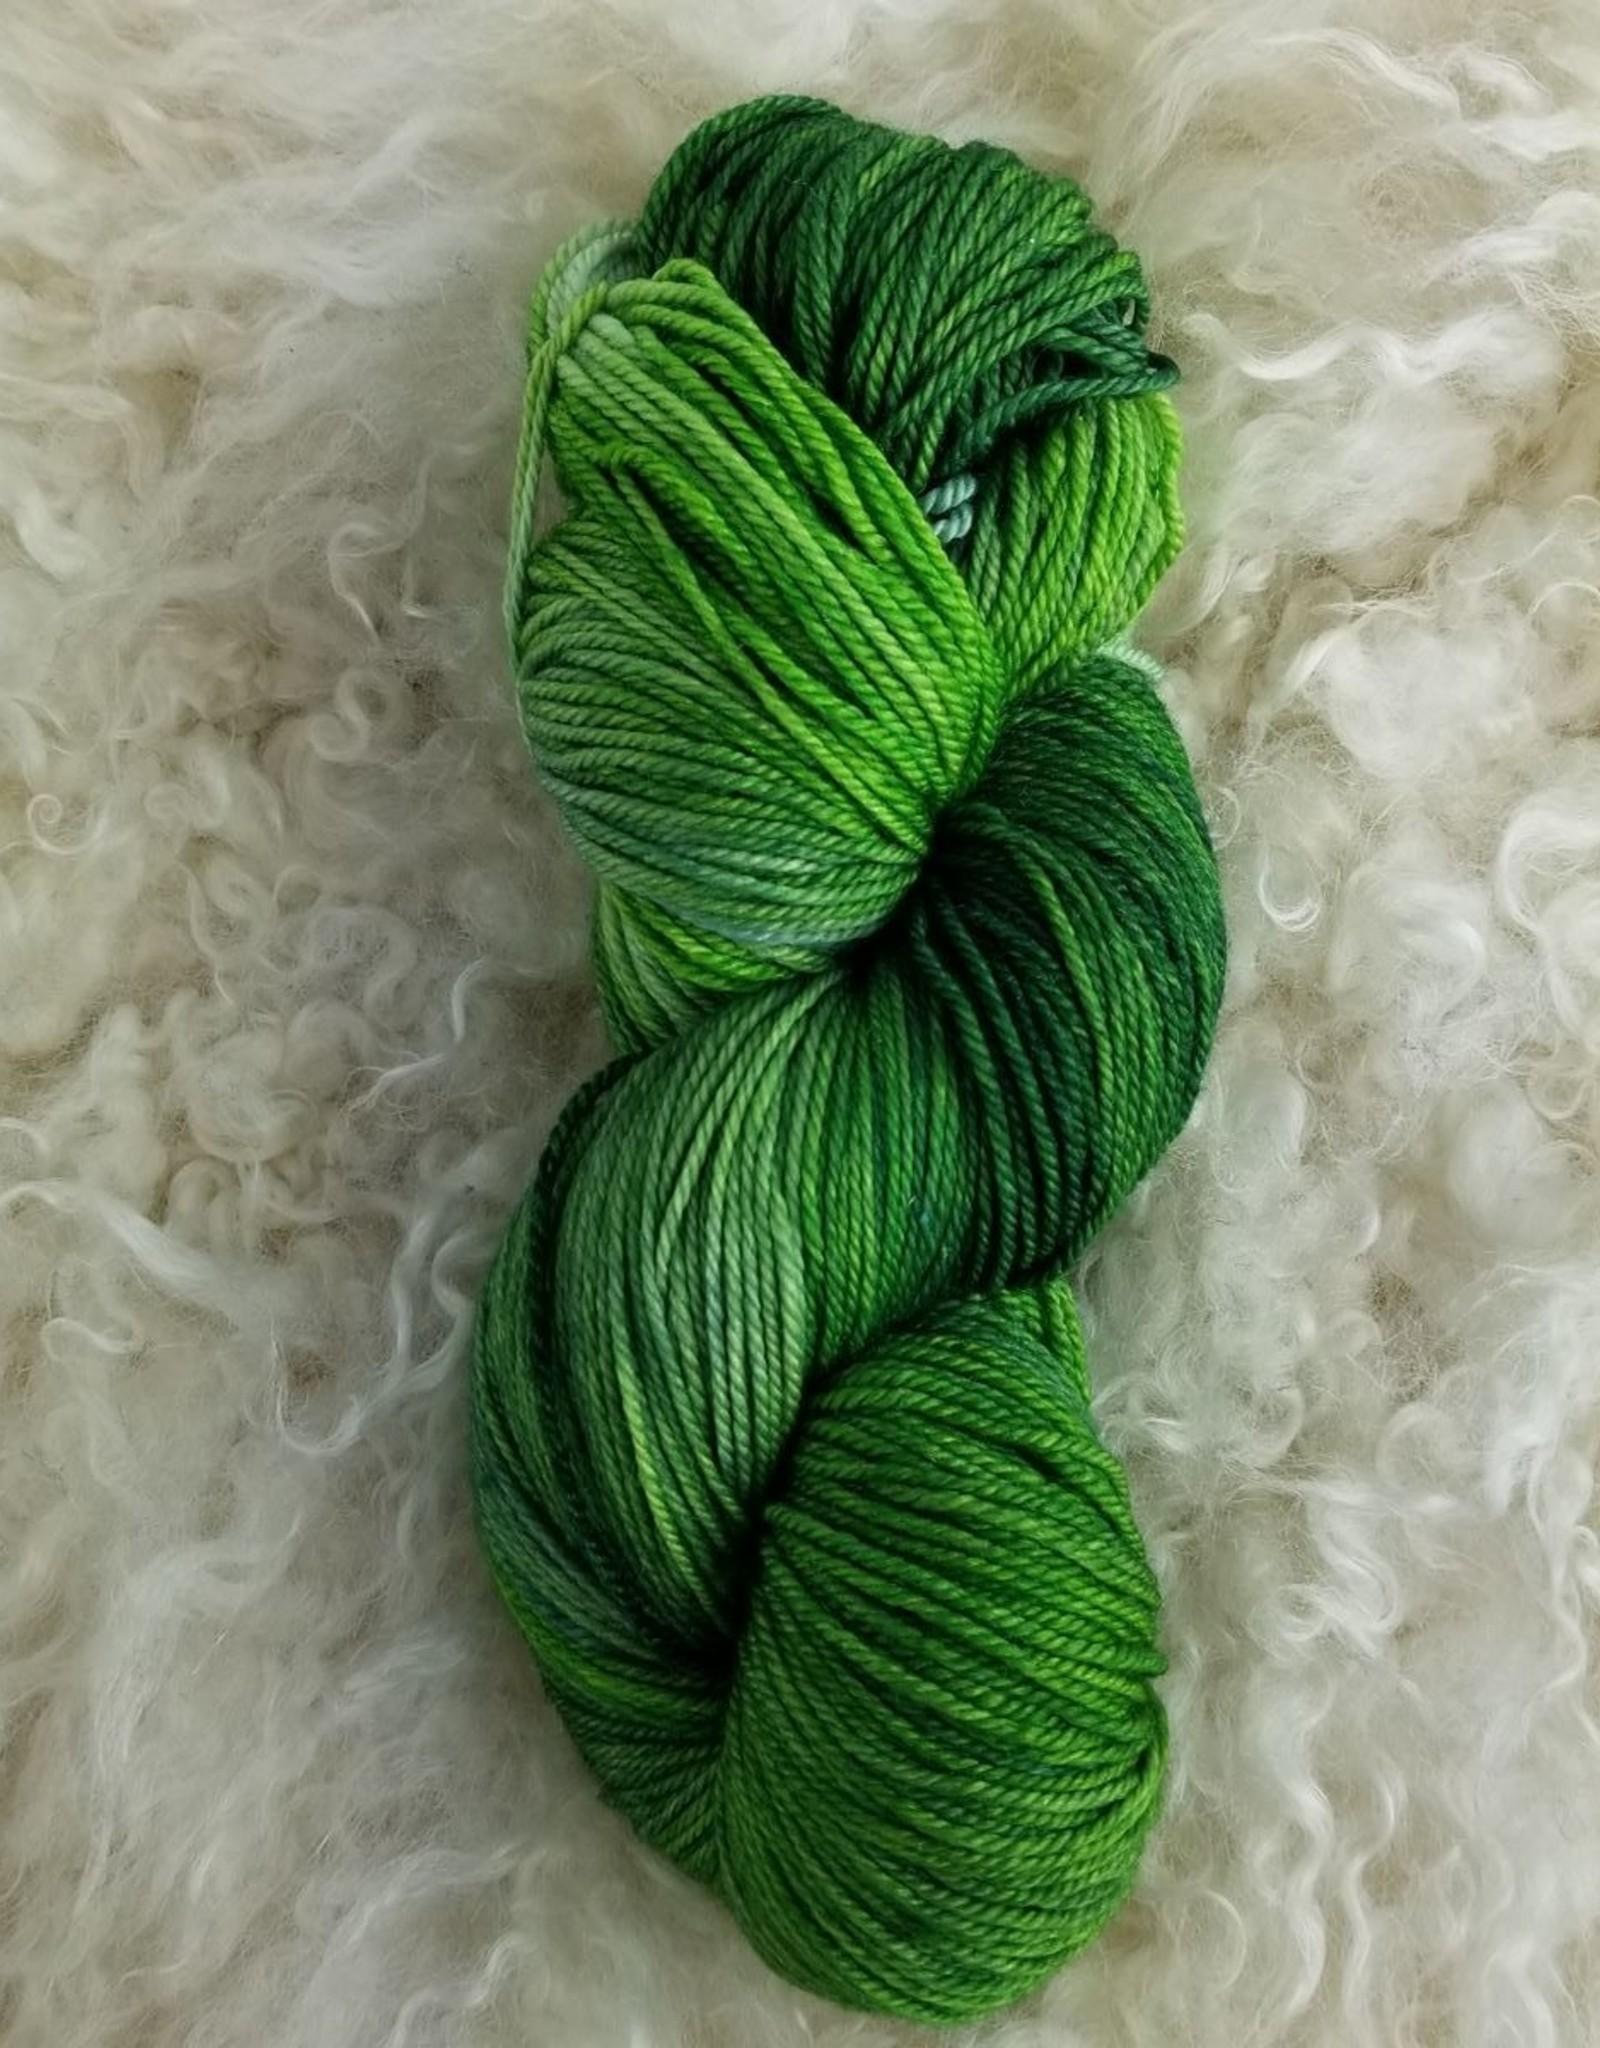 Palouse Yarn Co Cash Squeeze Wheatgrass